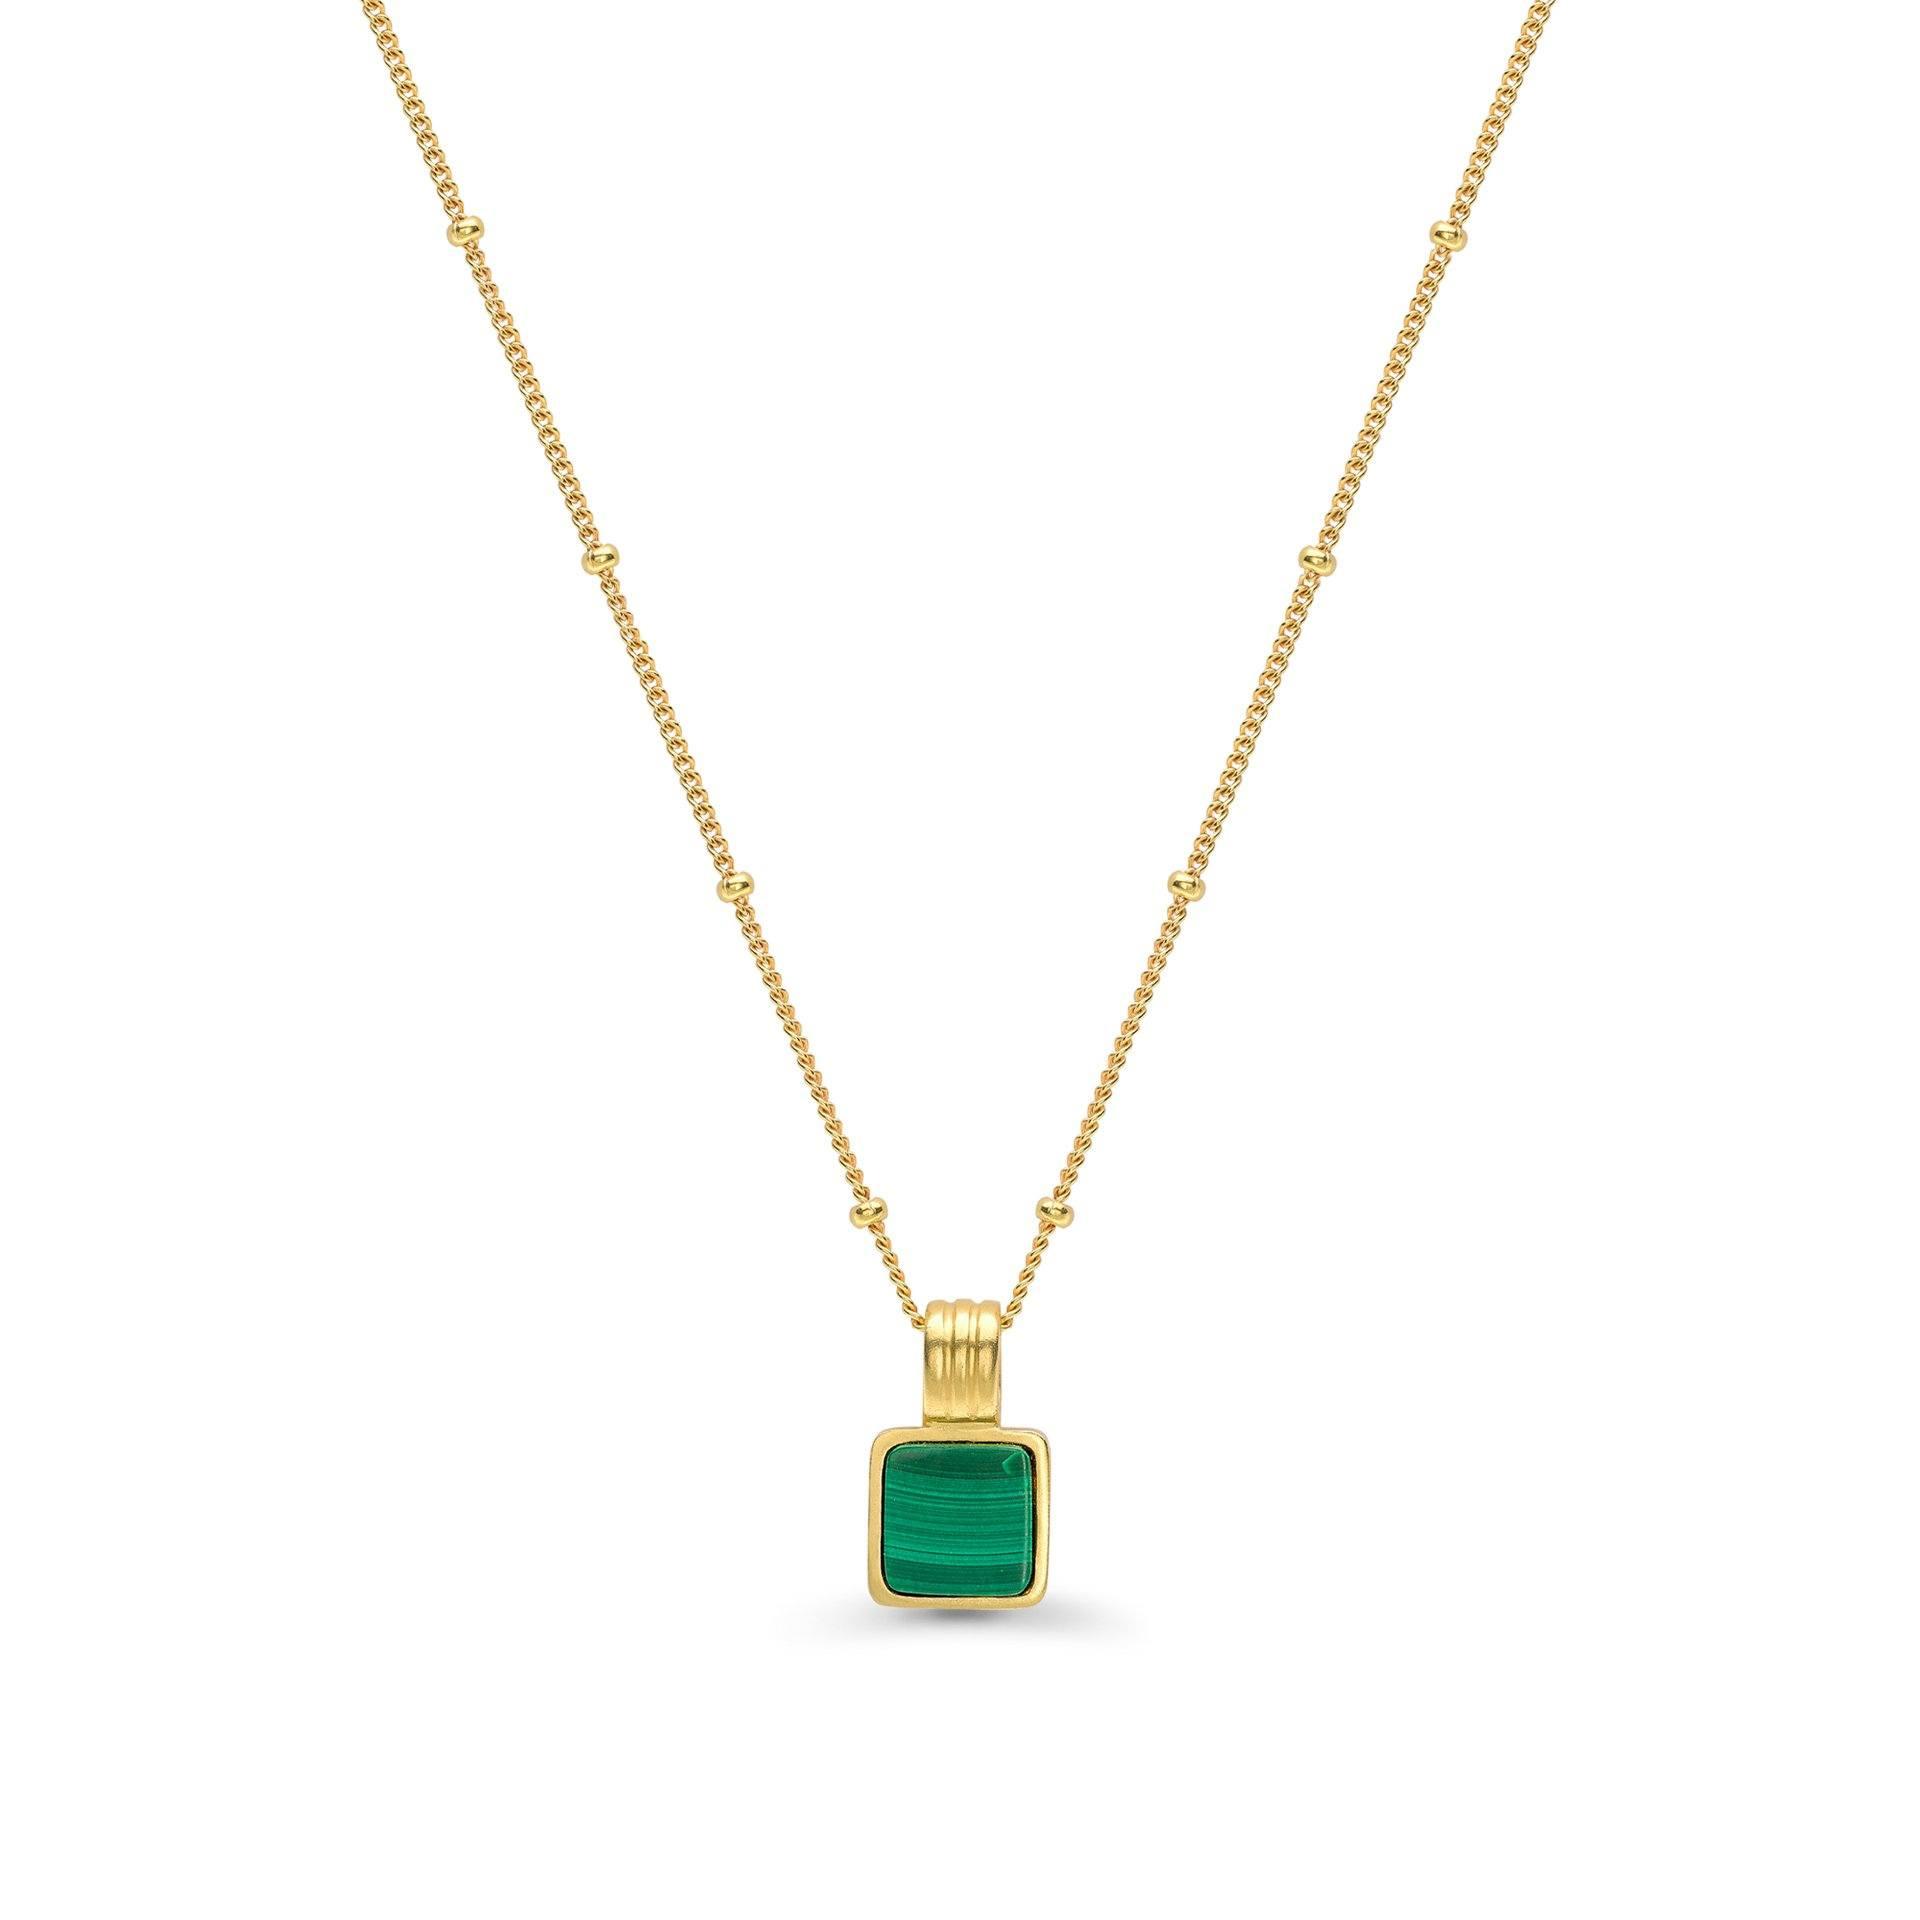 Wholesale OEM/ODM Jewelry Custom design Malachite gemstone set in 18ct gold vermeil pendant on chain 20 years in OEM jewelry